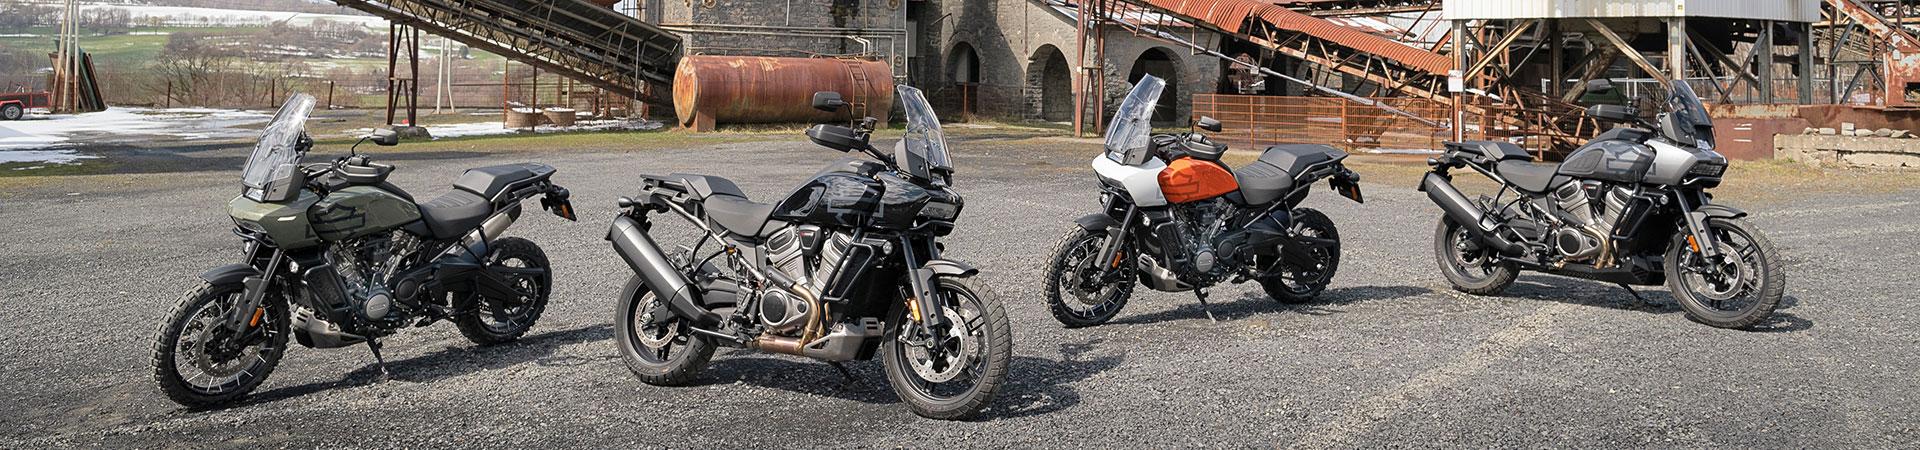 Titelbild-Harley-Davidson-Pan-America-Farben_27-05-2021_f3a28